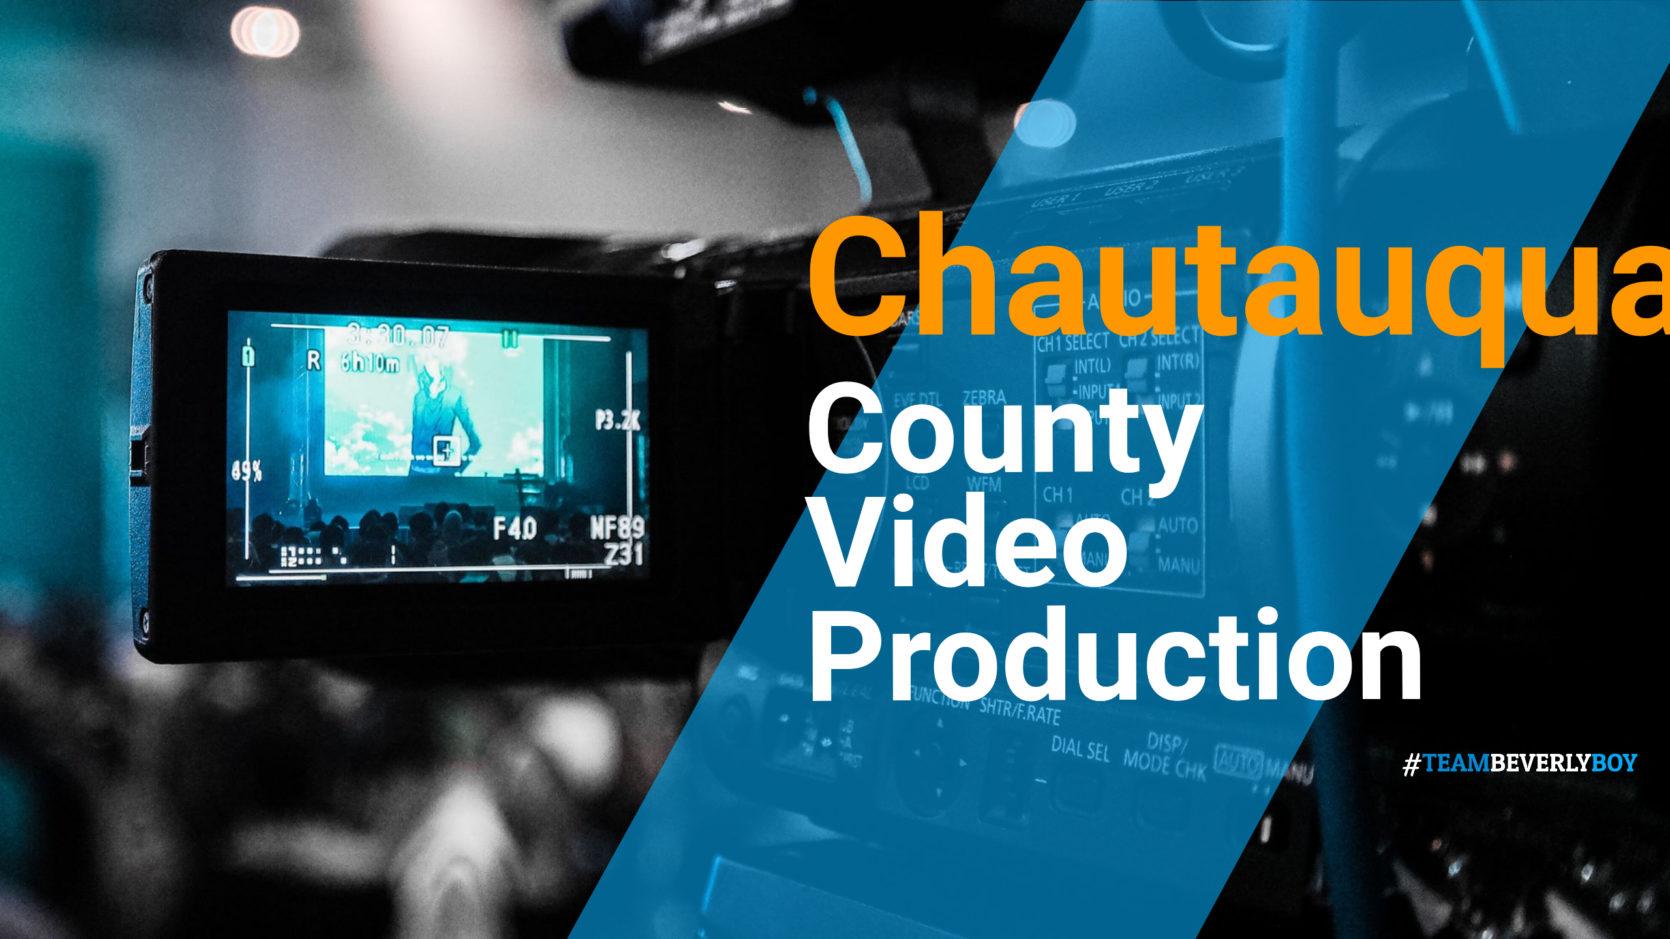 Chautauqua county Video Production